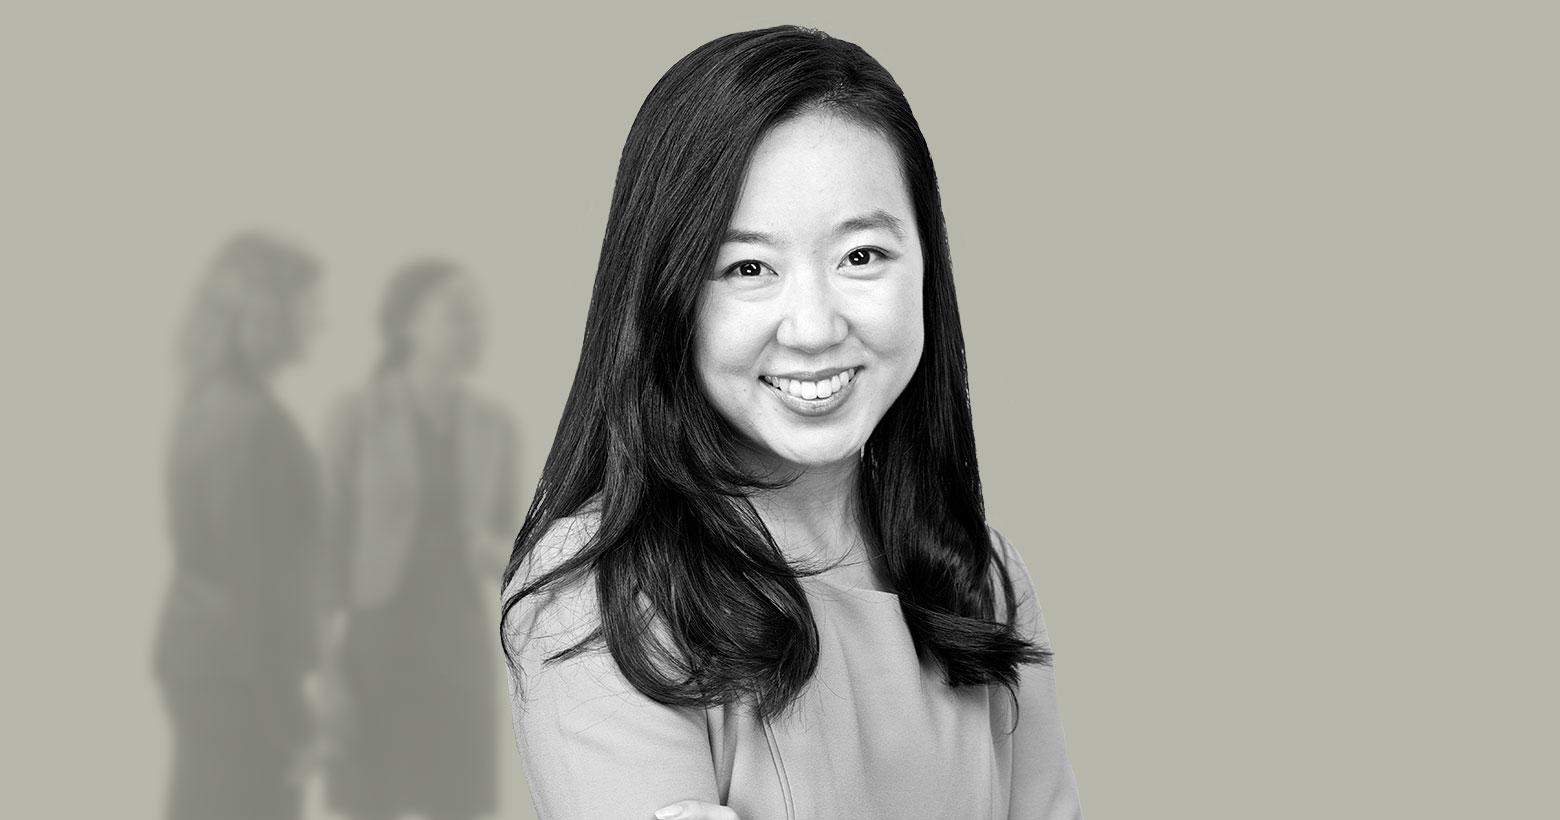 Ashley Sunha Yoon